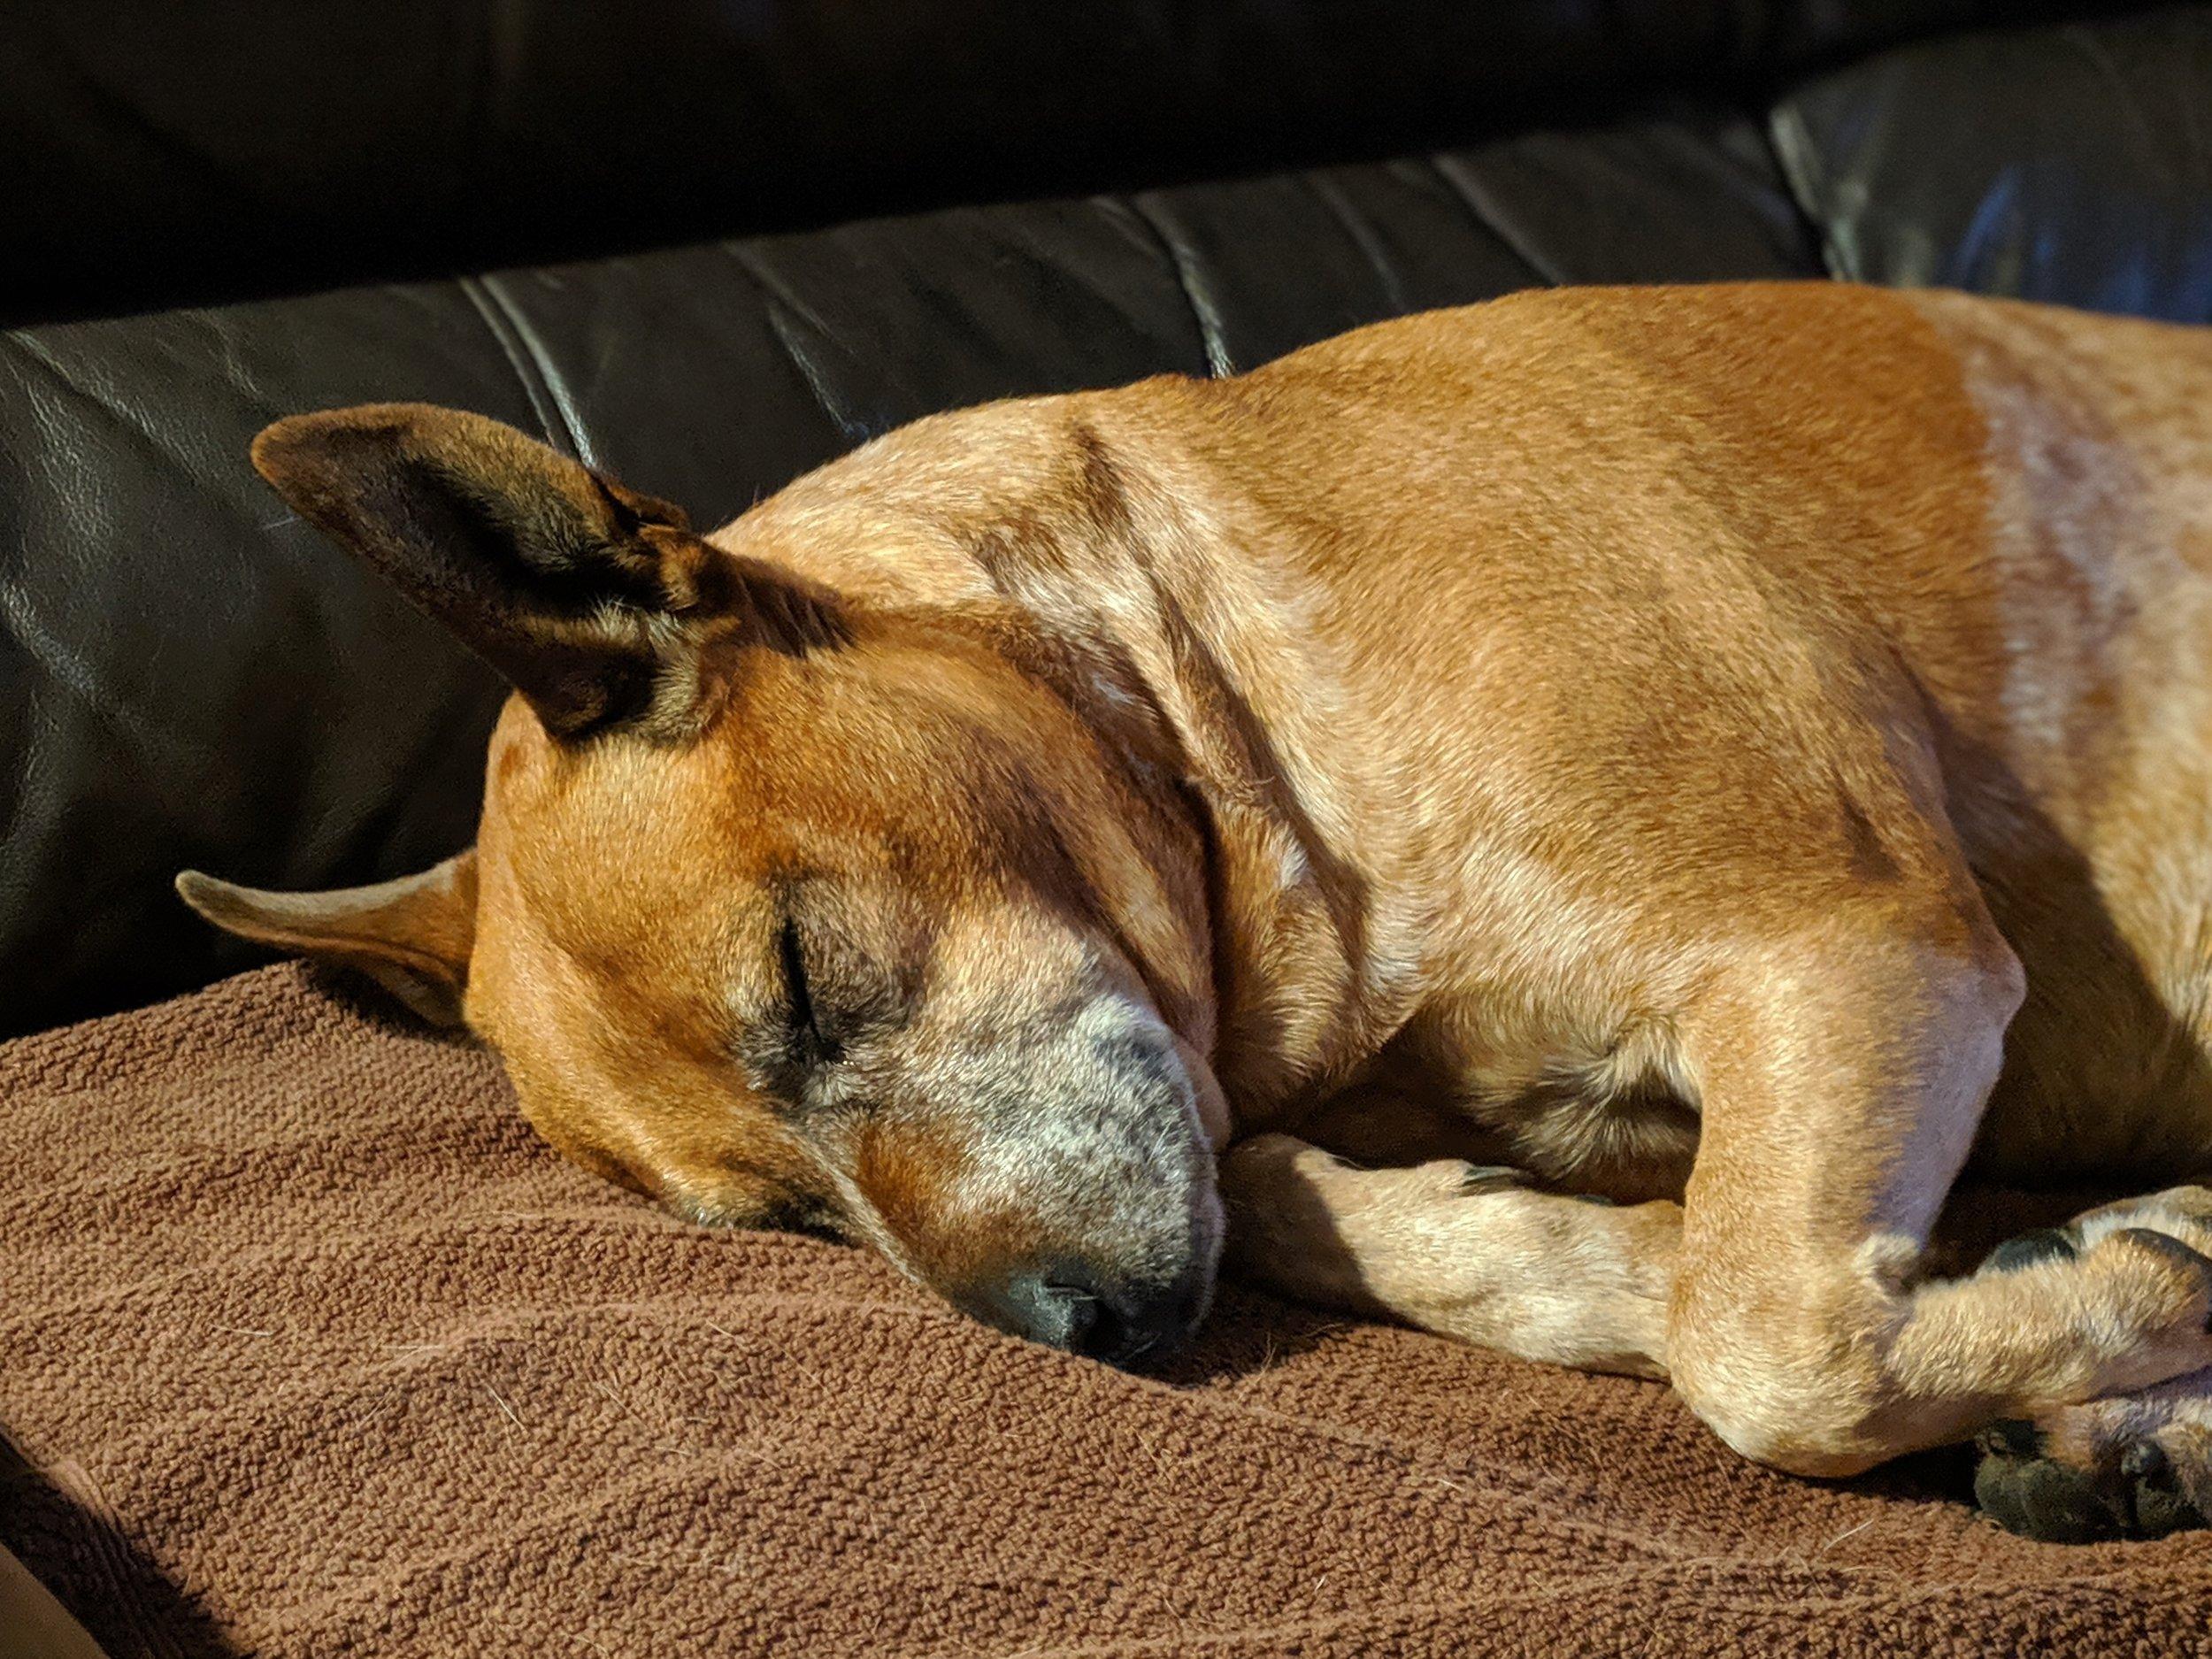 Fast asleep on the sofa.